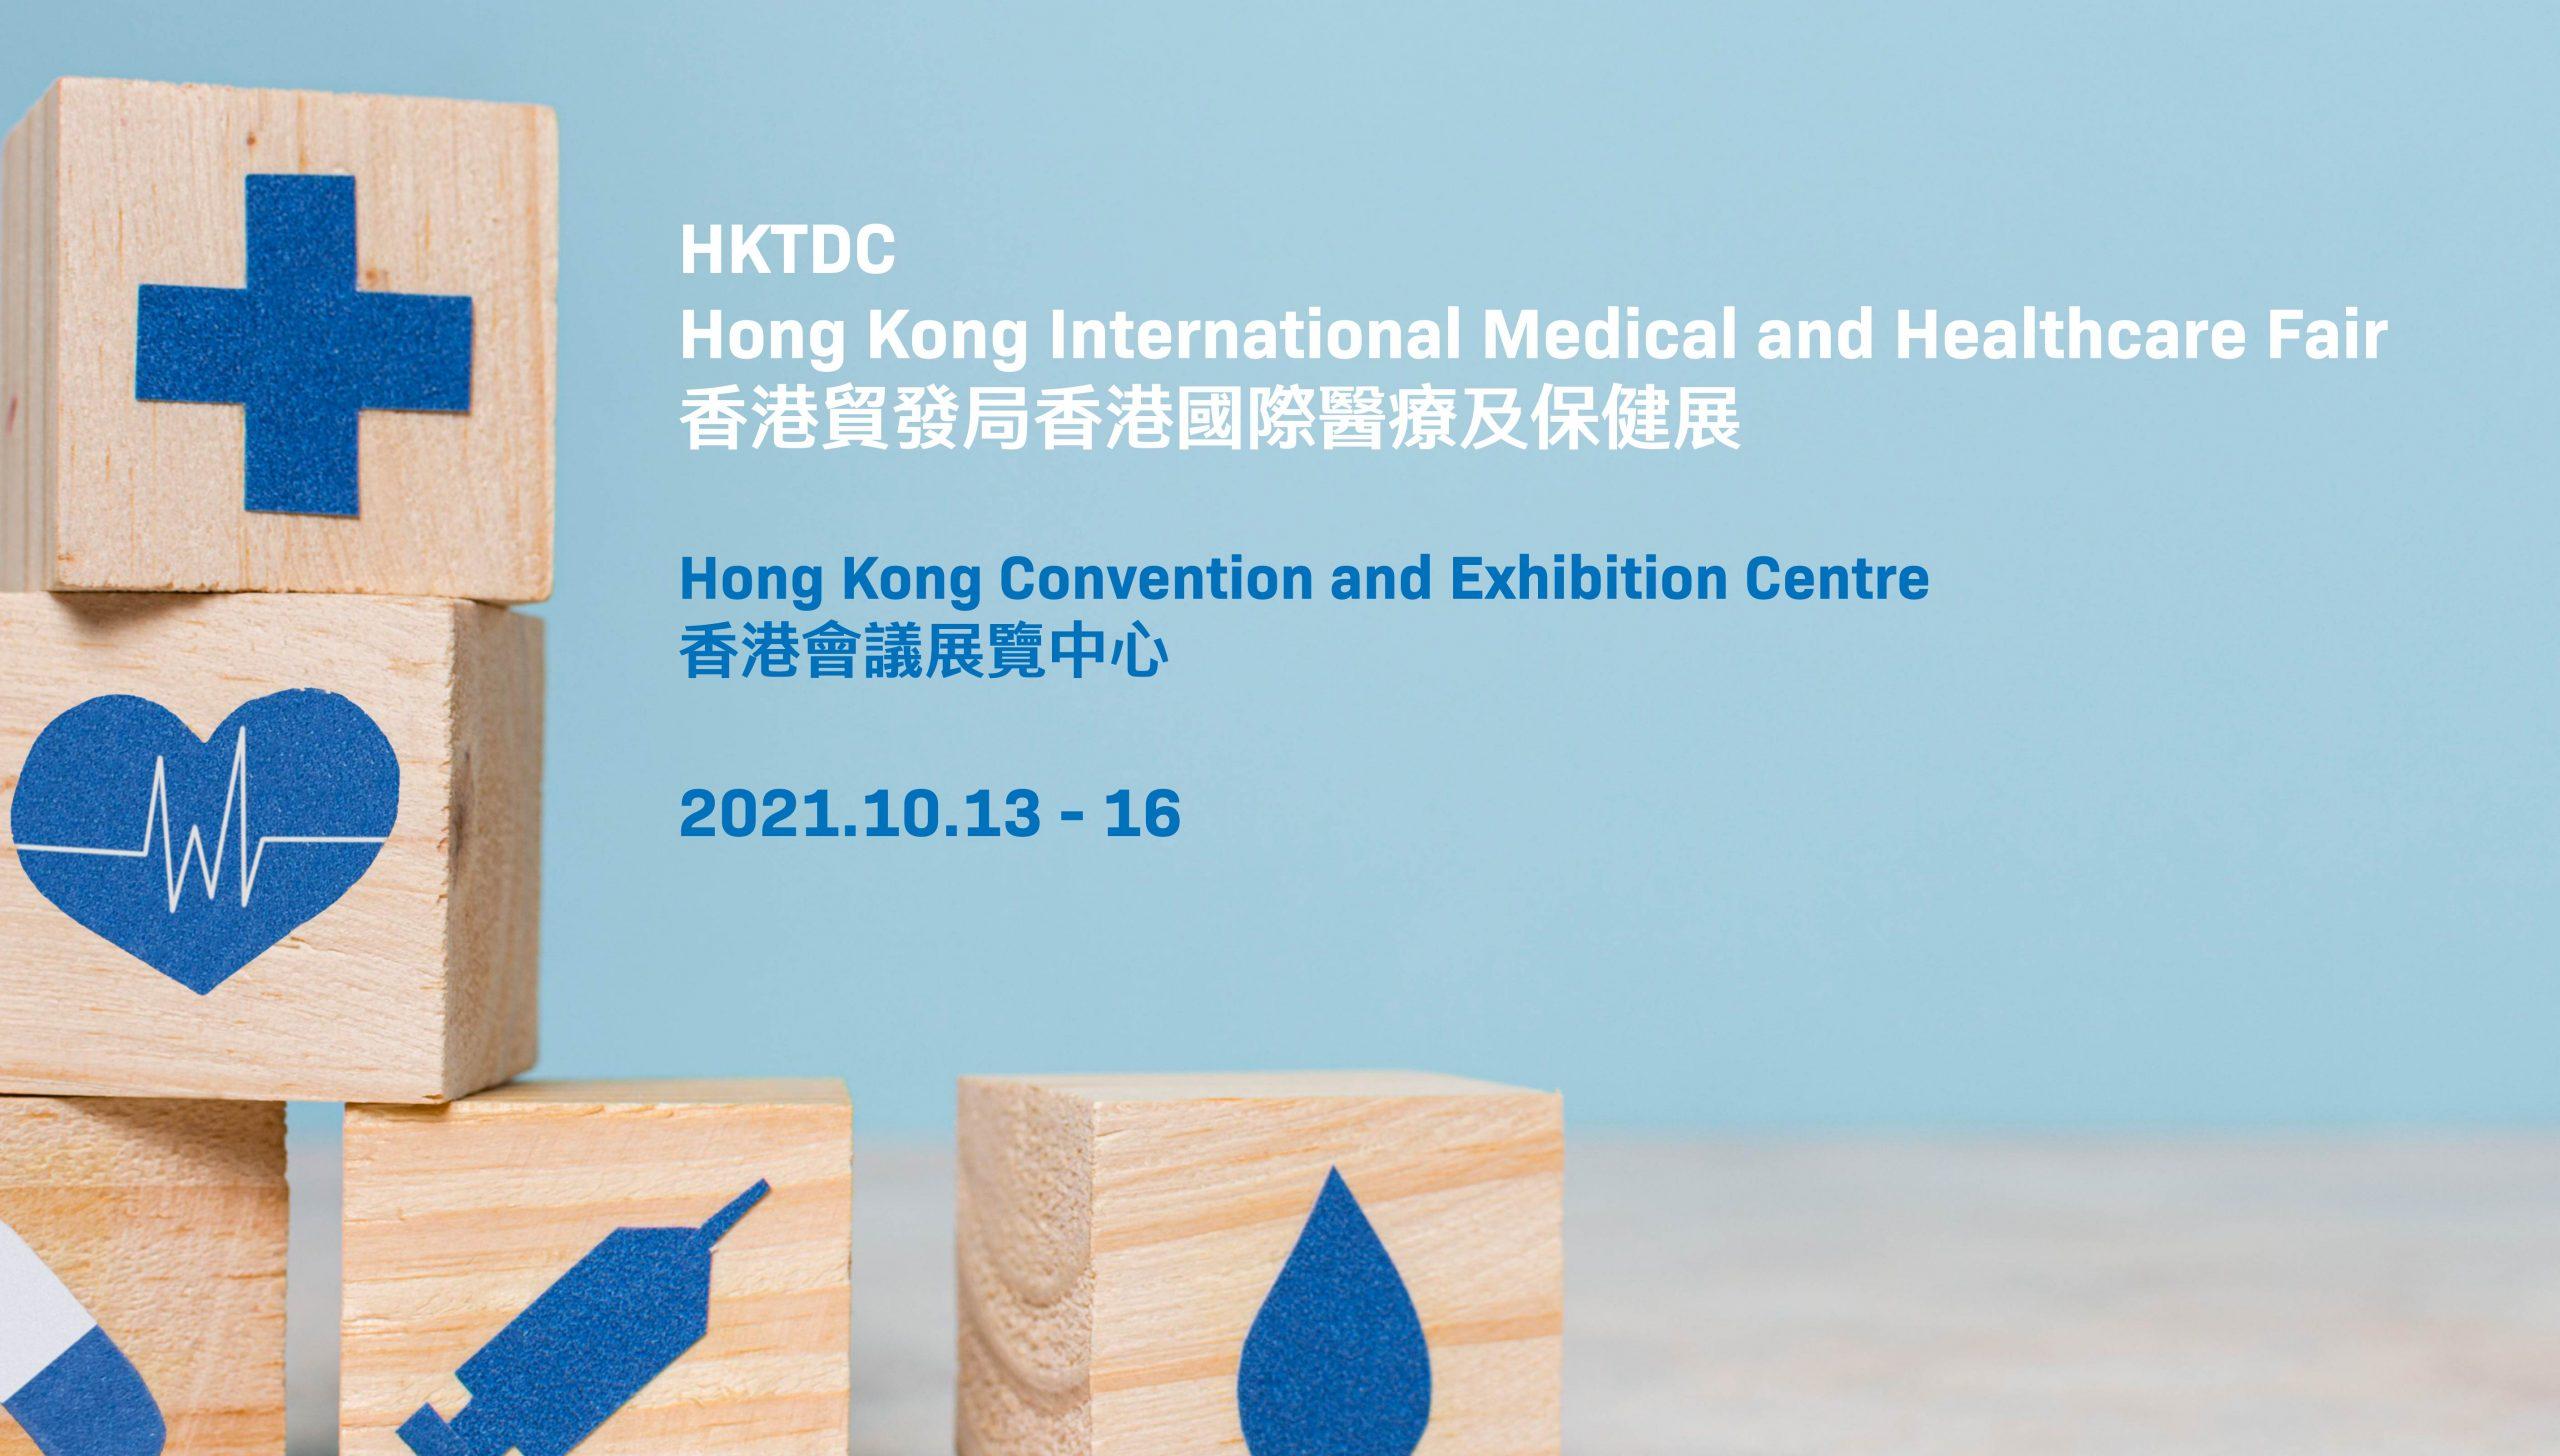 HK-Int.-Medical-and-Healthcare-Fair-2021